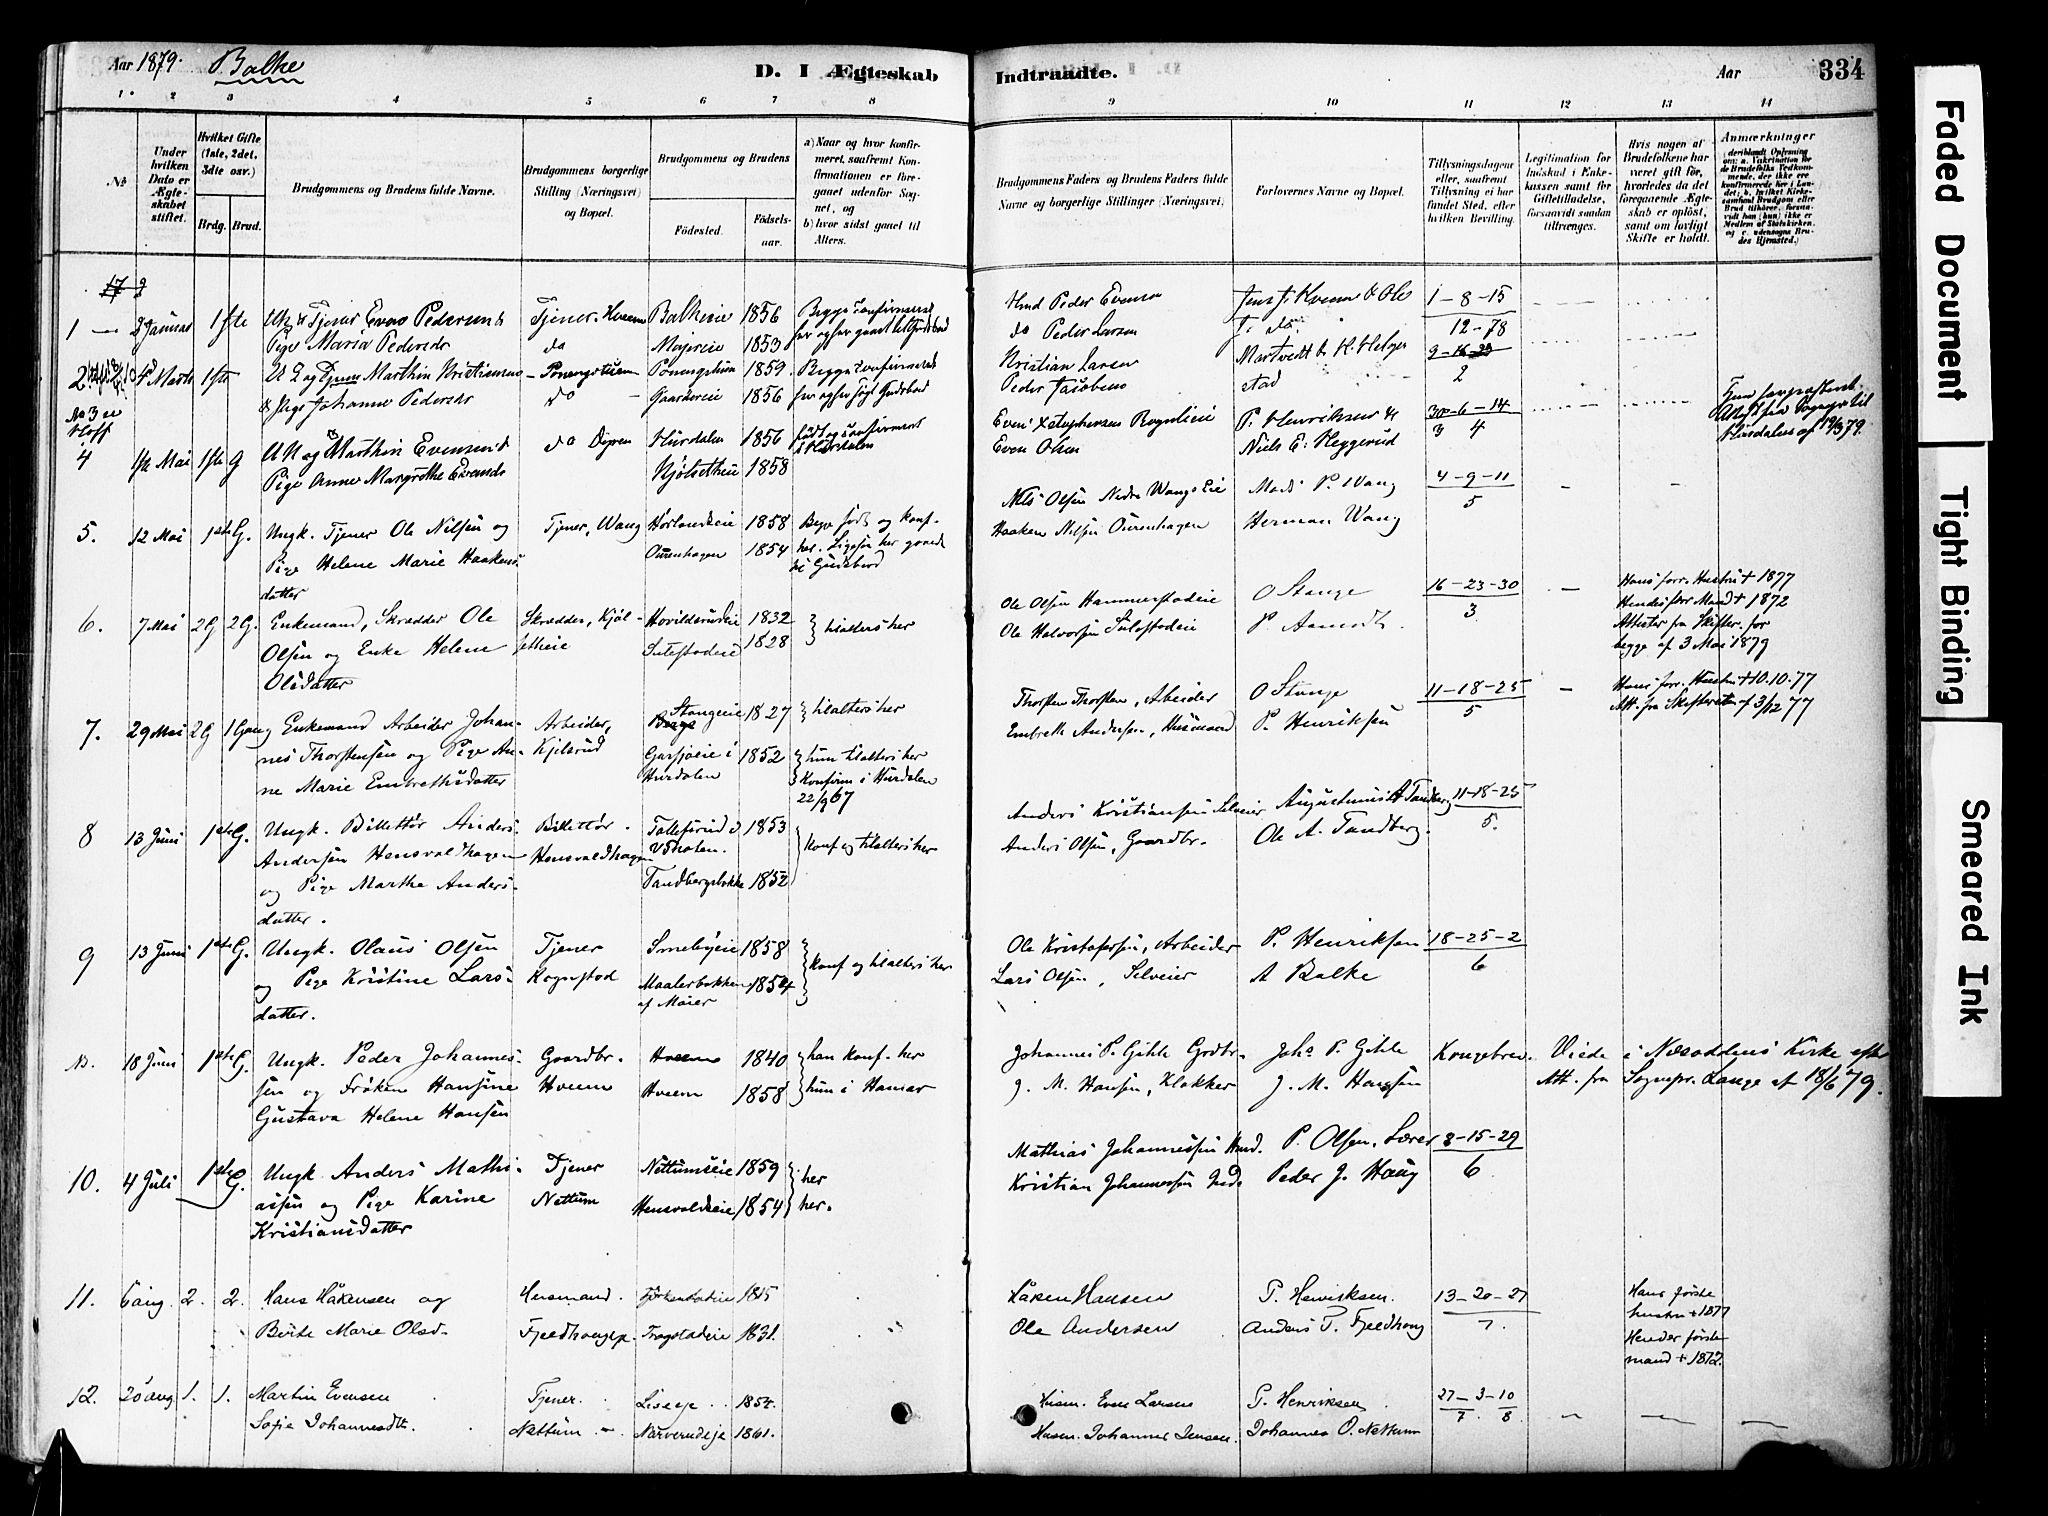 SAH, Østre Toten prestekontor, Ministerialbok nr. 6 /2, 1878-1880, s. 334